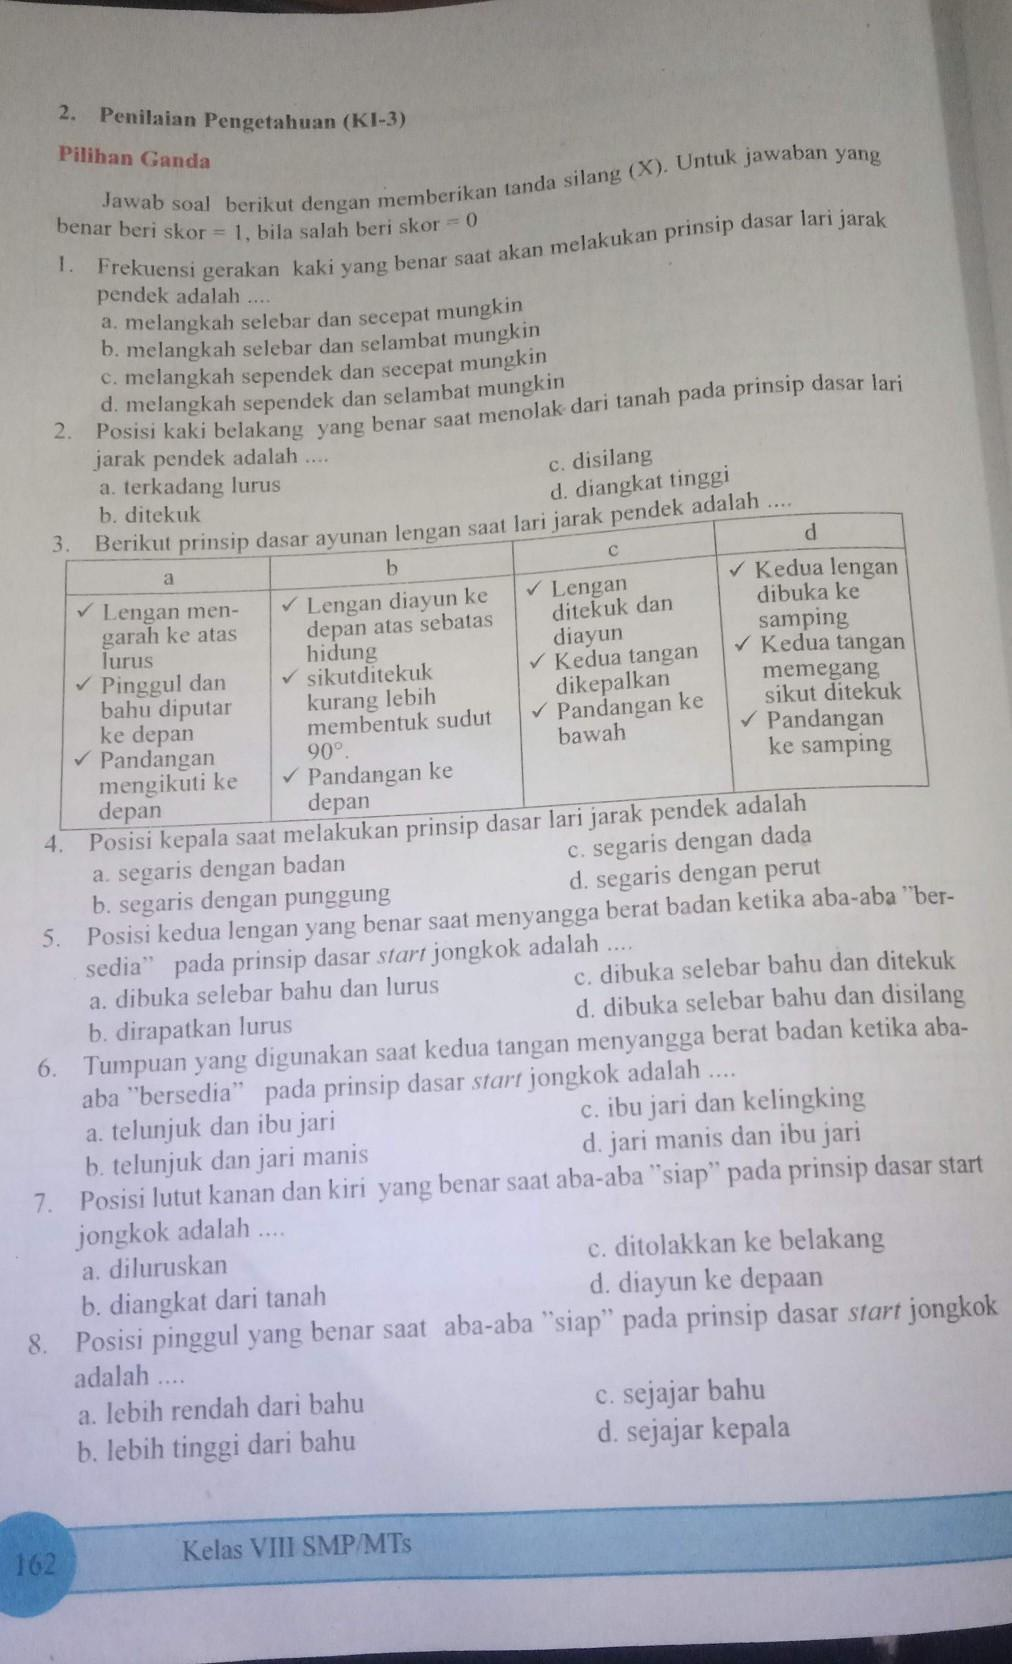 Tolong Kerjain Ya Kak Soal Pjok Kelas 8 Halaman 162 Dan 163 Bagian Pilihan Ganda Ajabakal Aku Brainly Co Id